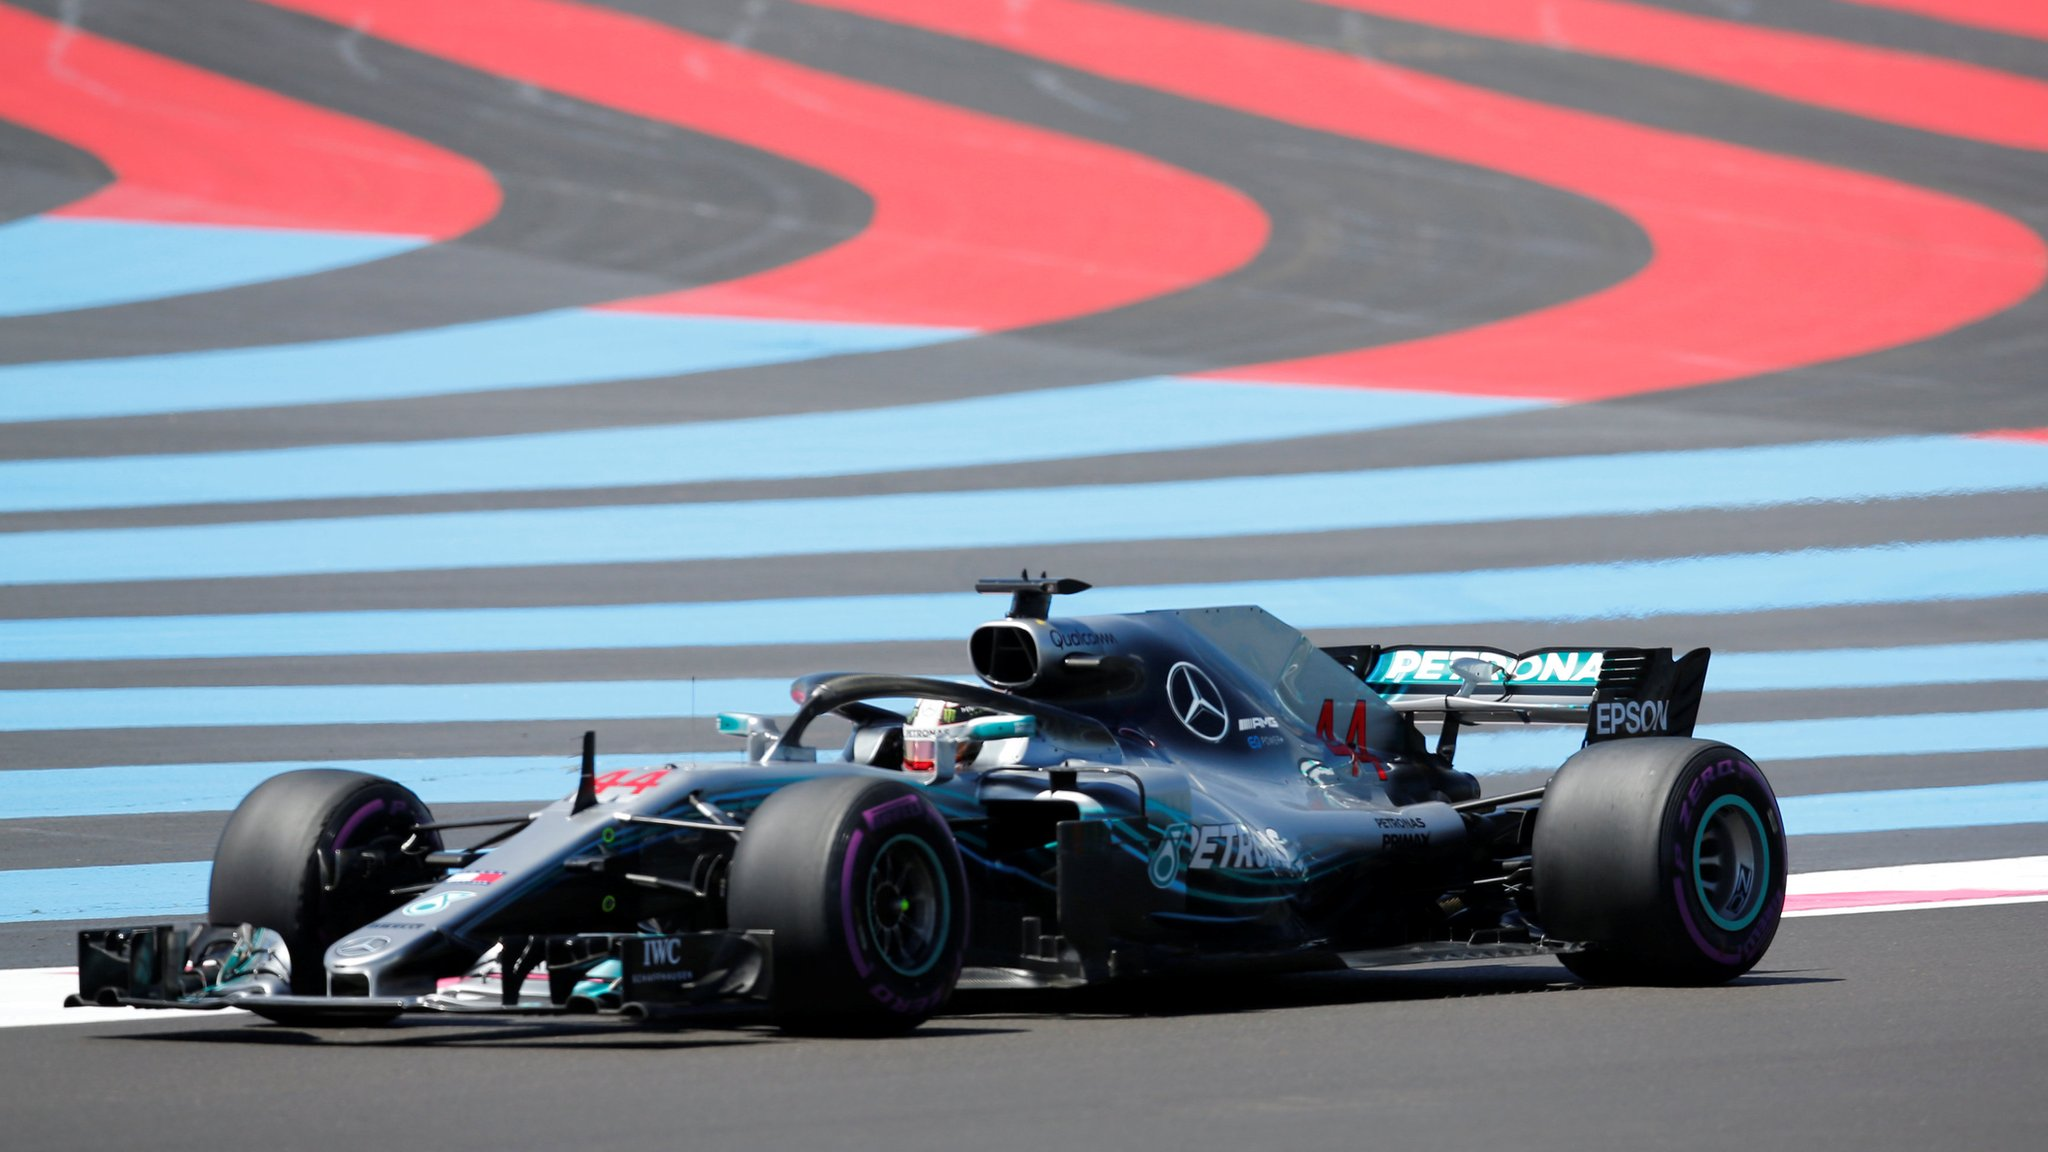 Lewis Hamilton fastest in French GP practice as Marcus Ericsson crashes